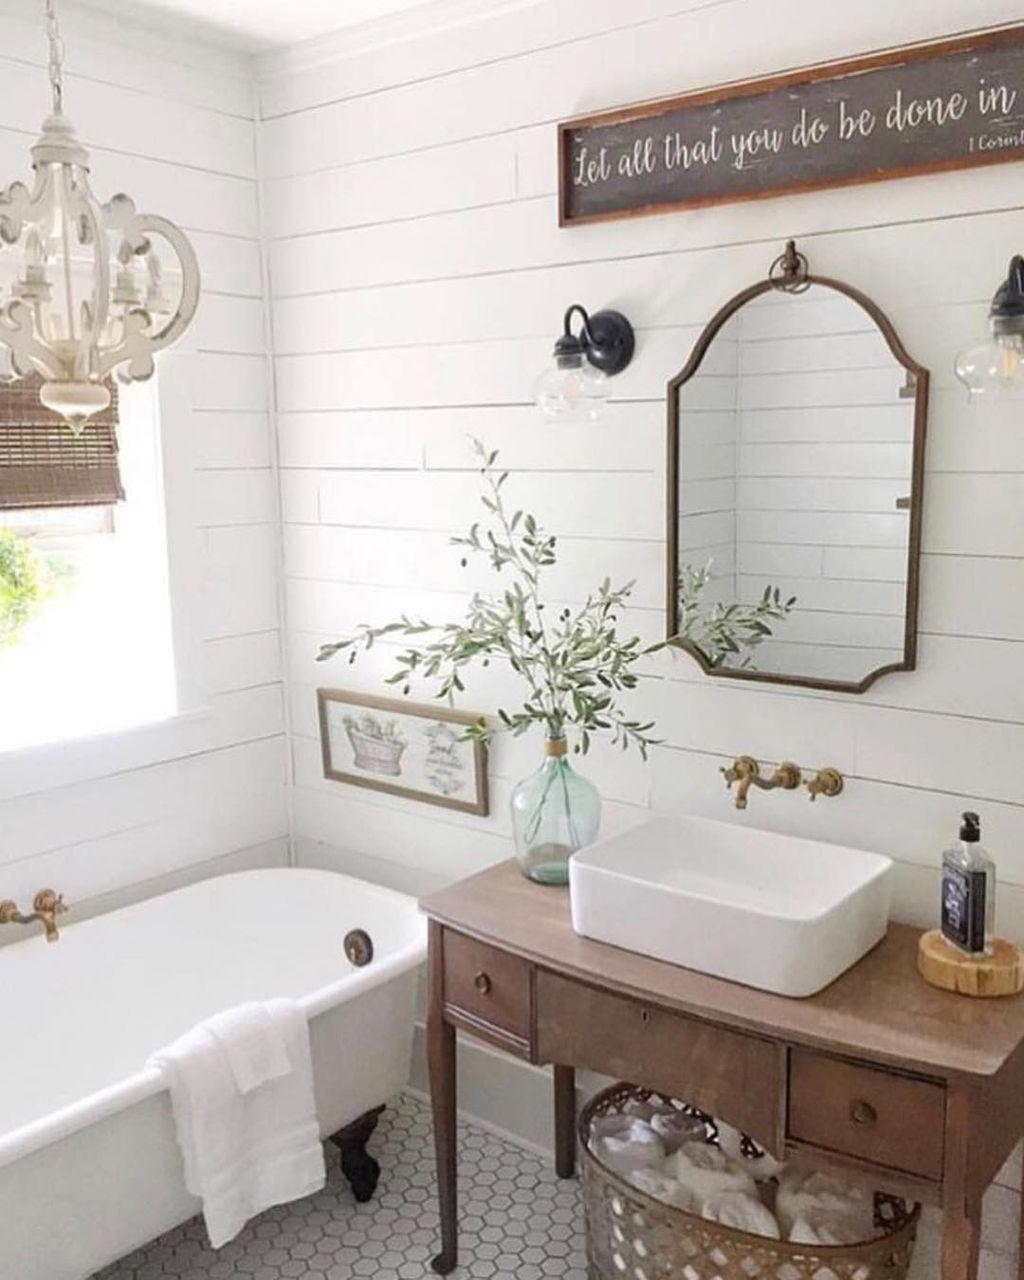 10 Best Bathroom With These Spanish Tile Bathroom Ideas Small Farmhouse Bathroom Farmhouse Bathroom Decor Bathroom Styling